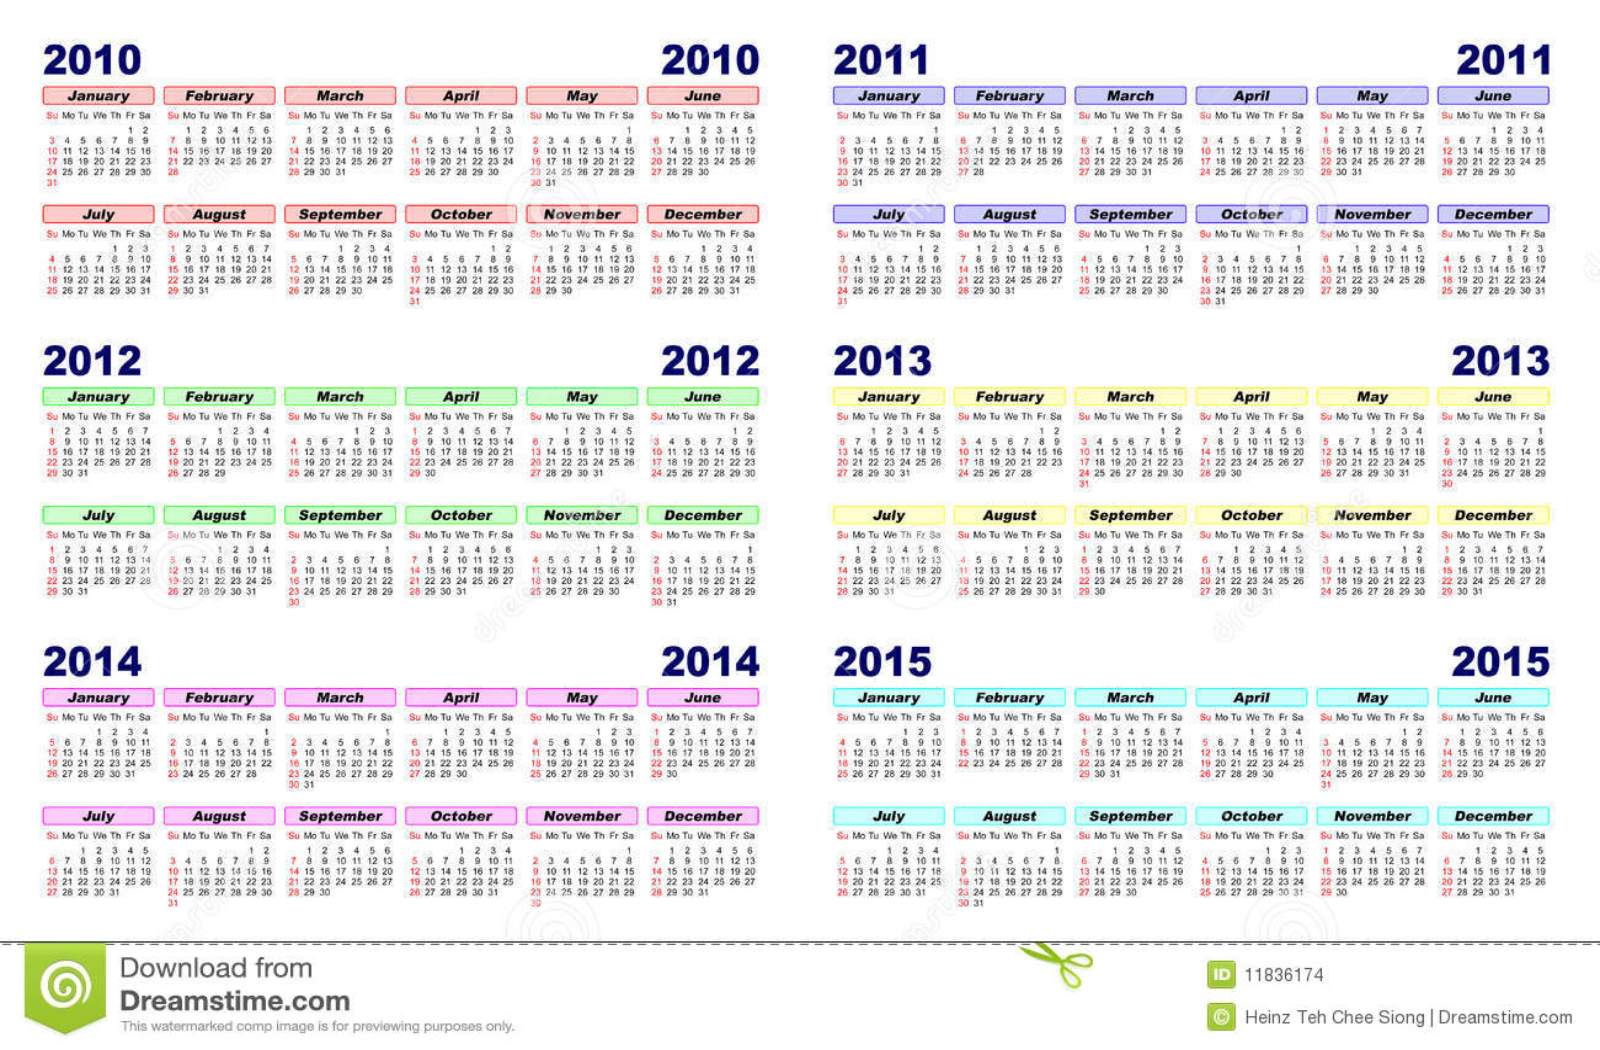 Calendar 2010-2015 Stock Images - Image: 11836174